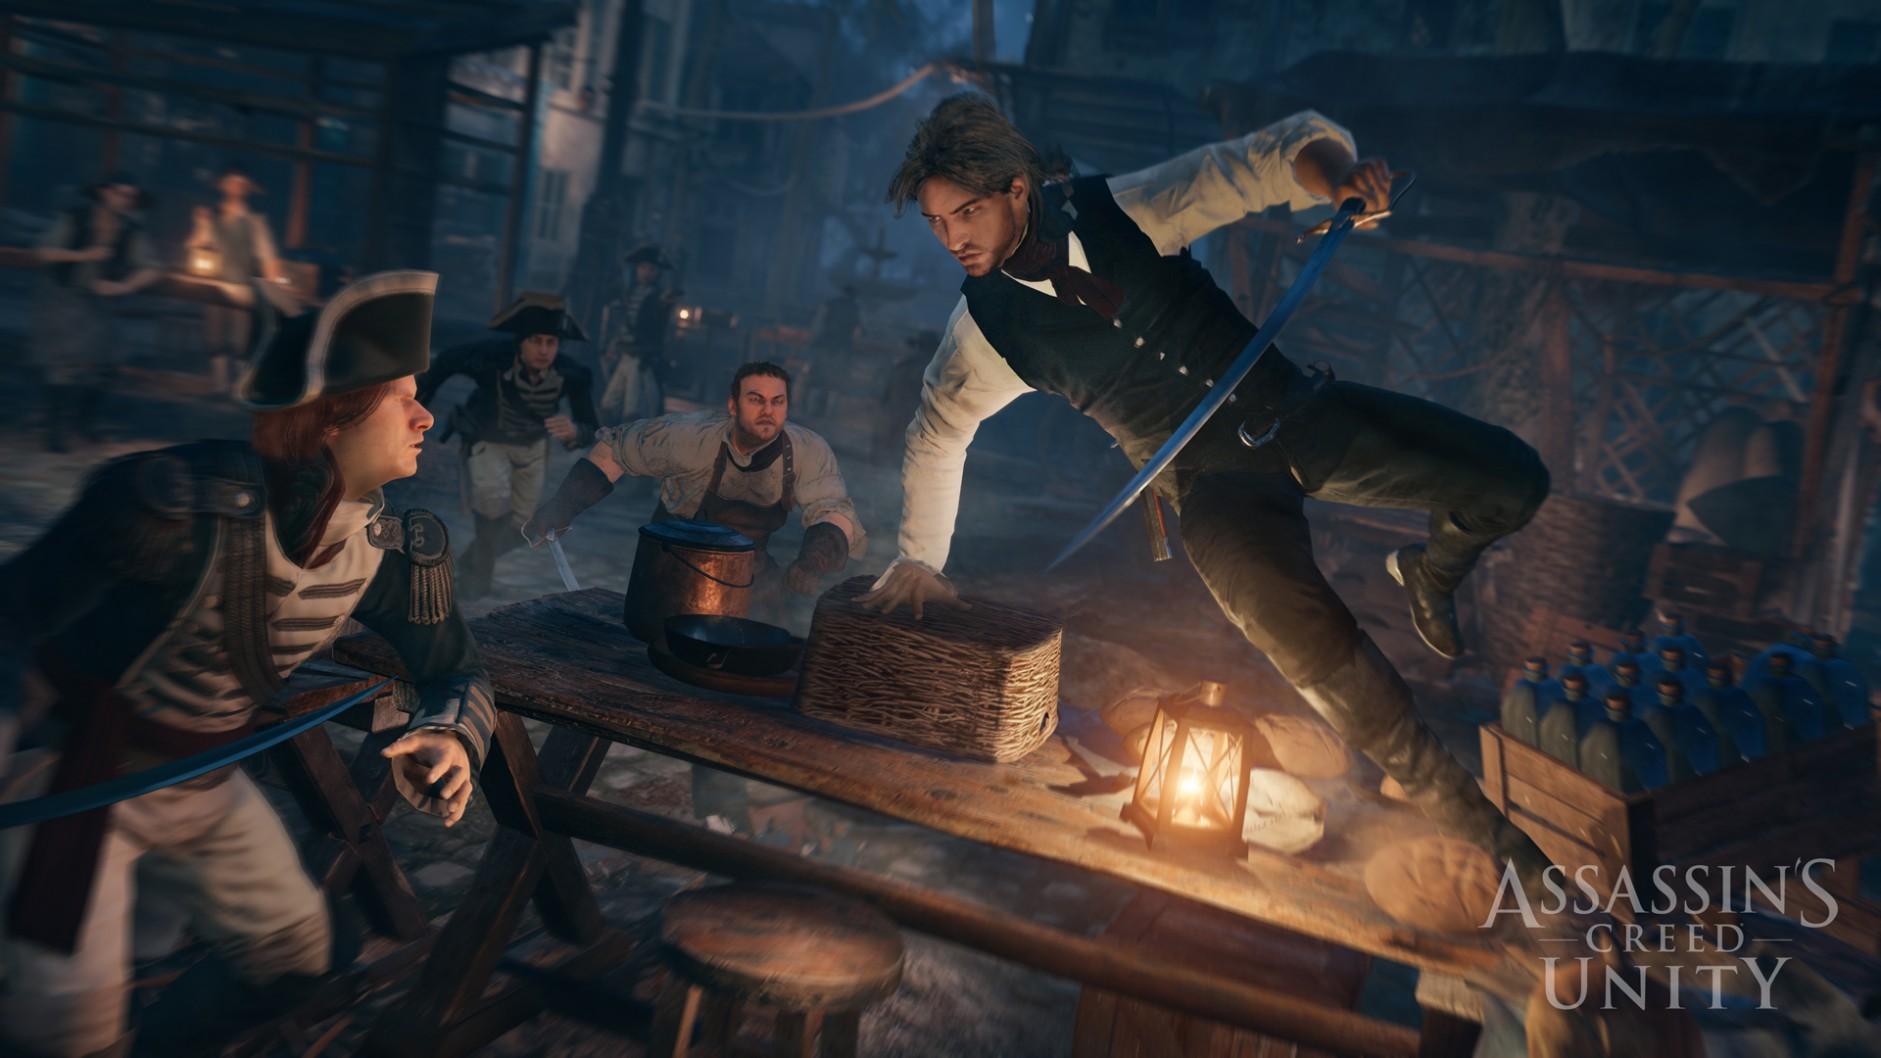 Assassin-Creed-Unity-PC-Version